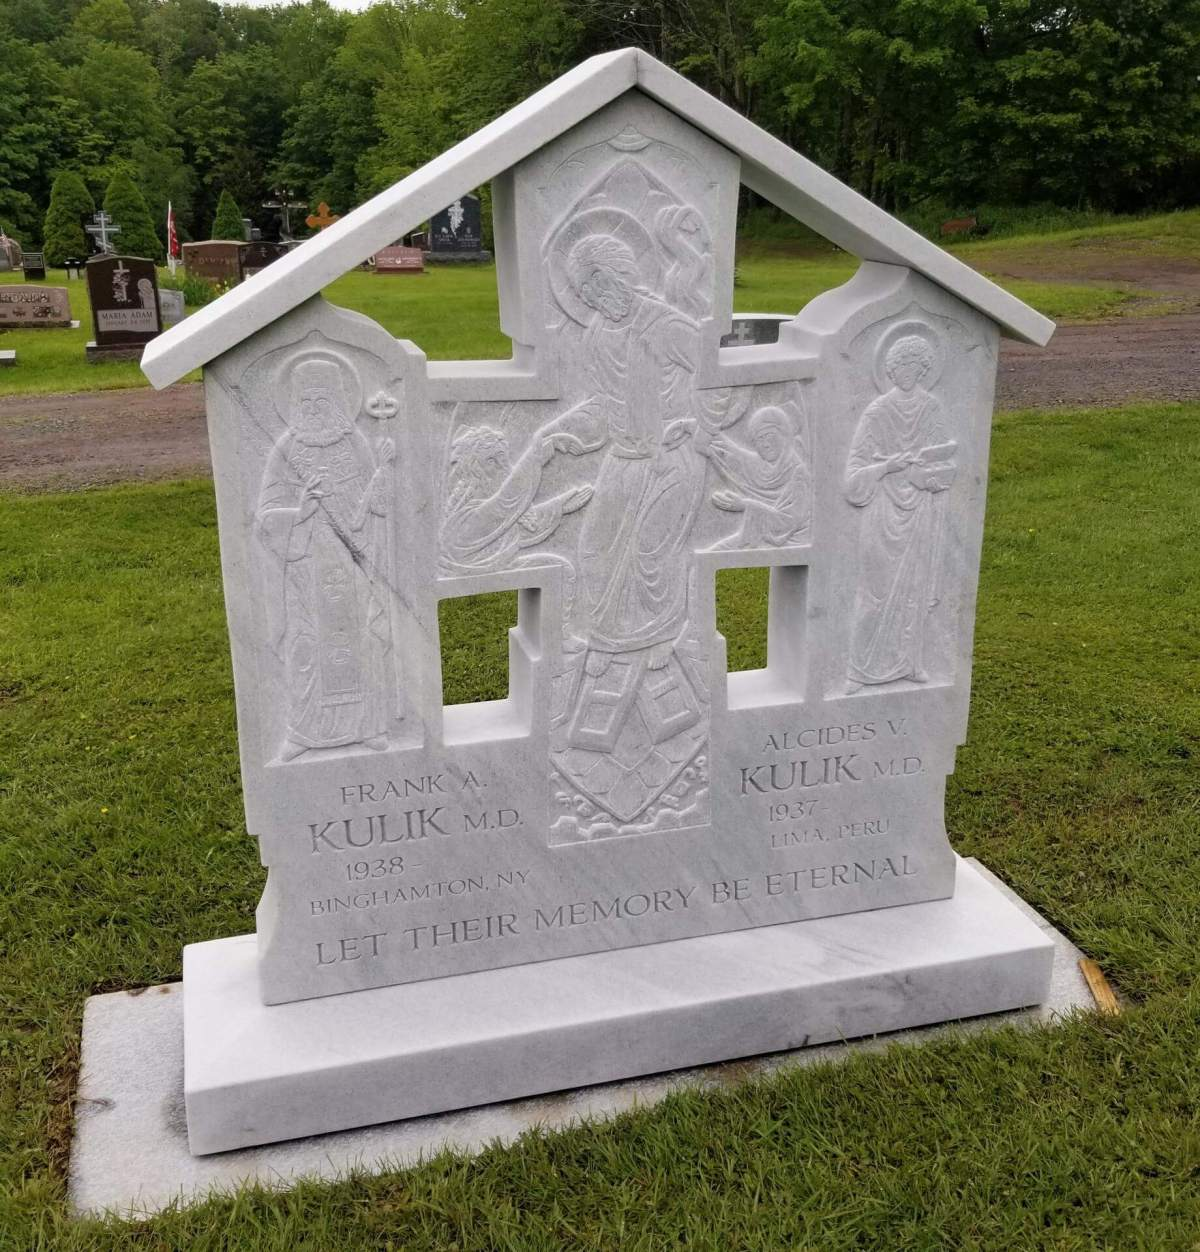 Grave Crosses and Burial Shroud